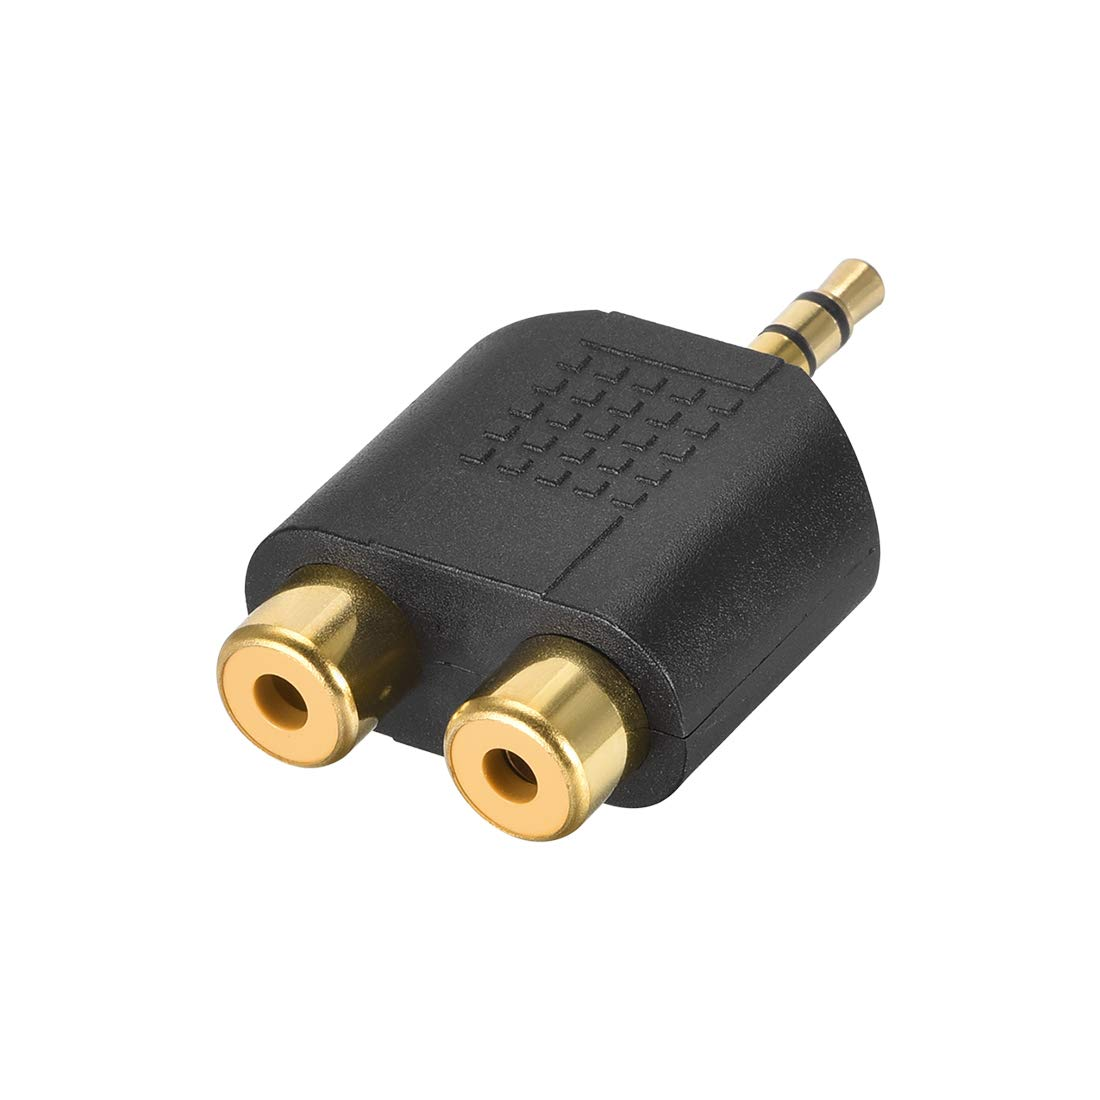 uxcell 3.5mm Male to 2 RCA Female Connector Splitter Adapter Coupler Black for Stereo Audio Video AV TV Cable Convert 1pcs